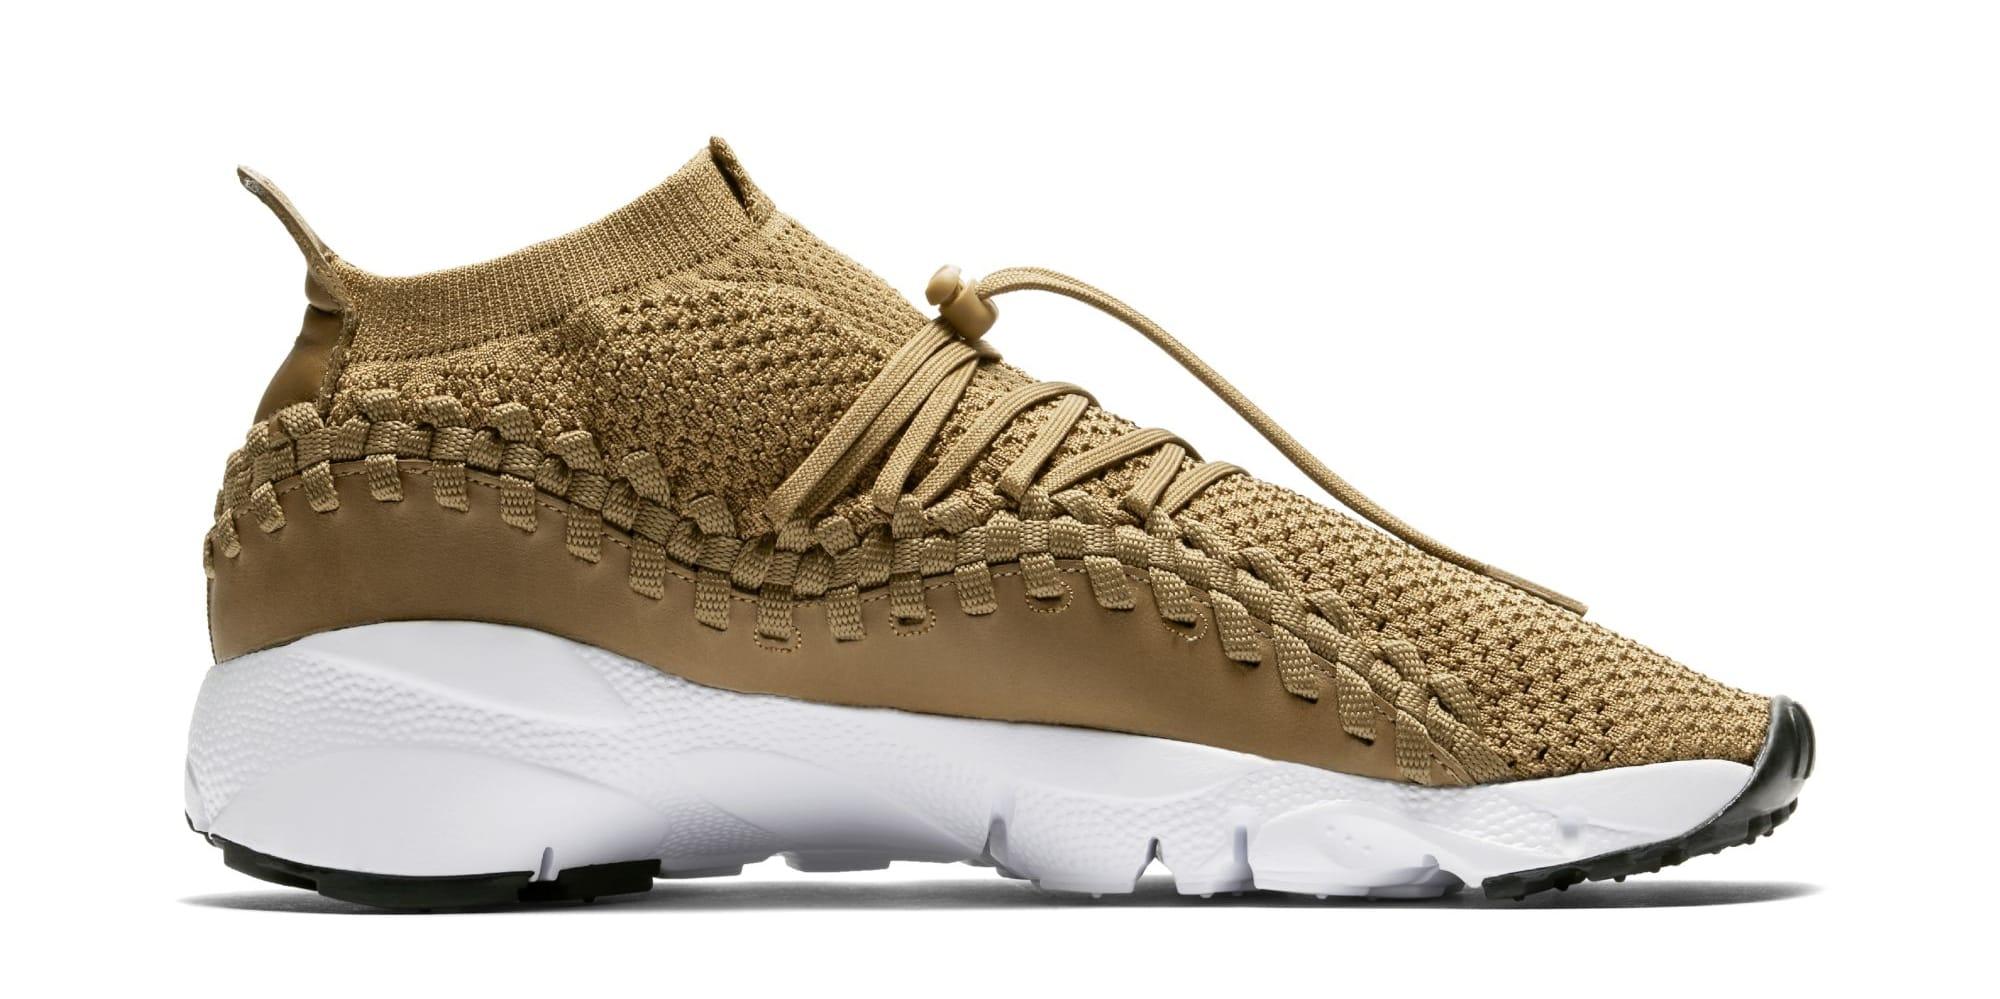 Nike Footscape Woven Chukka Flyknit 'Golden Beige' AO5417-400 (Medial)